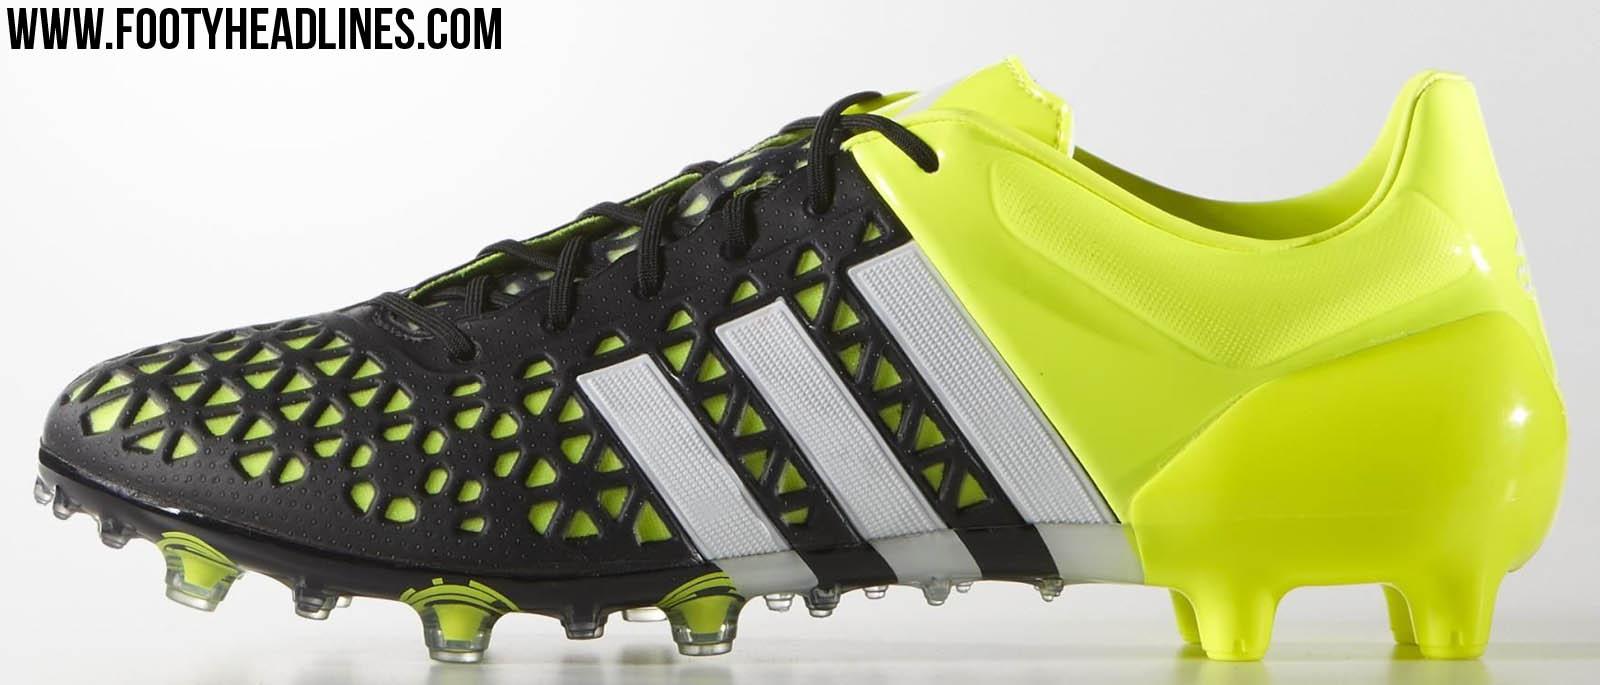 85e2e93ce2ab Adidas Ace 15.1 FG   AG Black   Silver Metallic   Solar Yellow. This is the  new ...